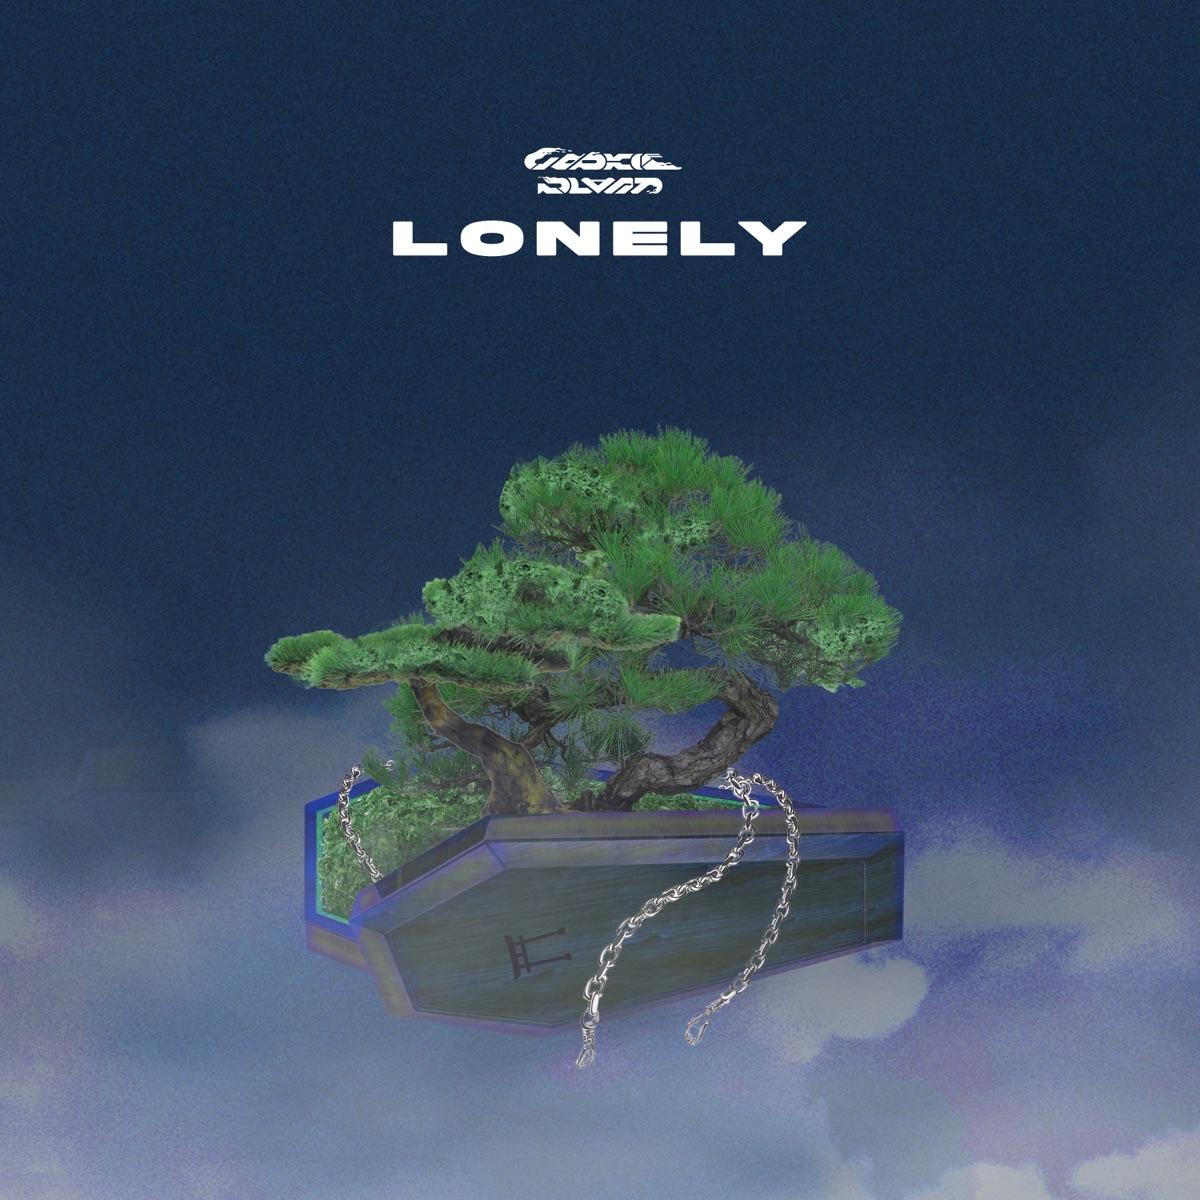 『Cookie Plant - Lonely』収録の『Lonely』ジャケット